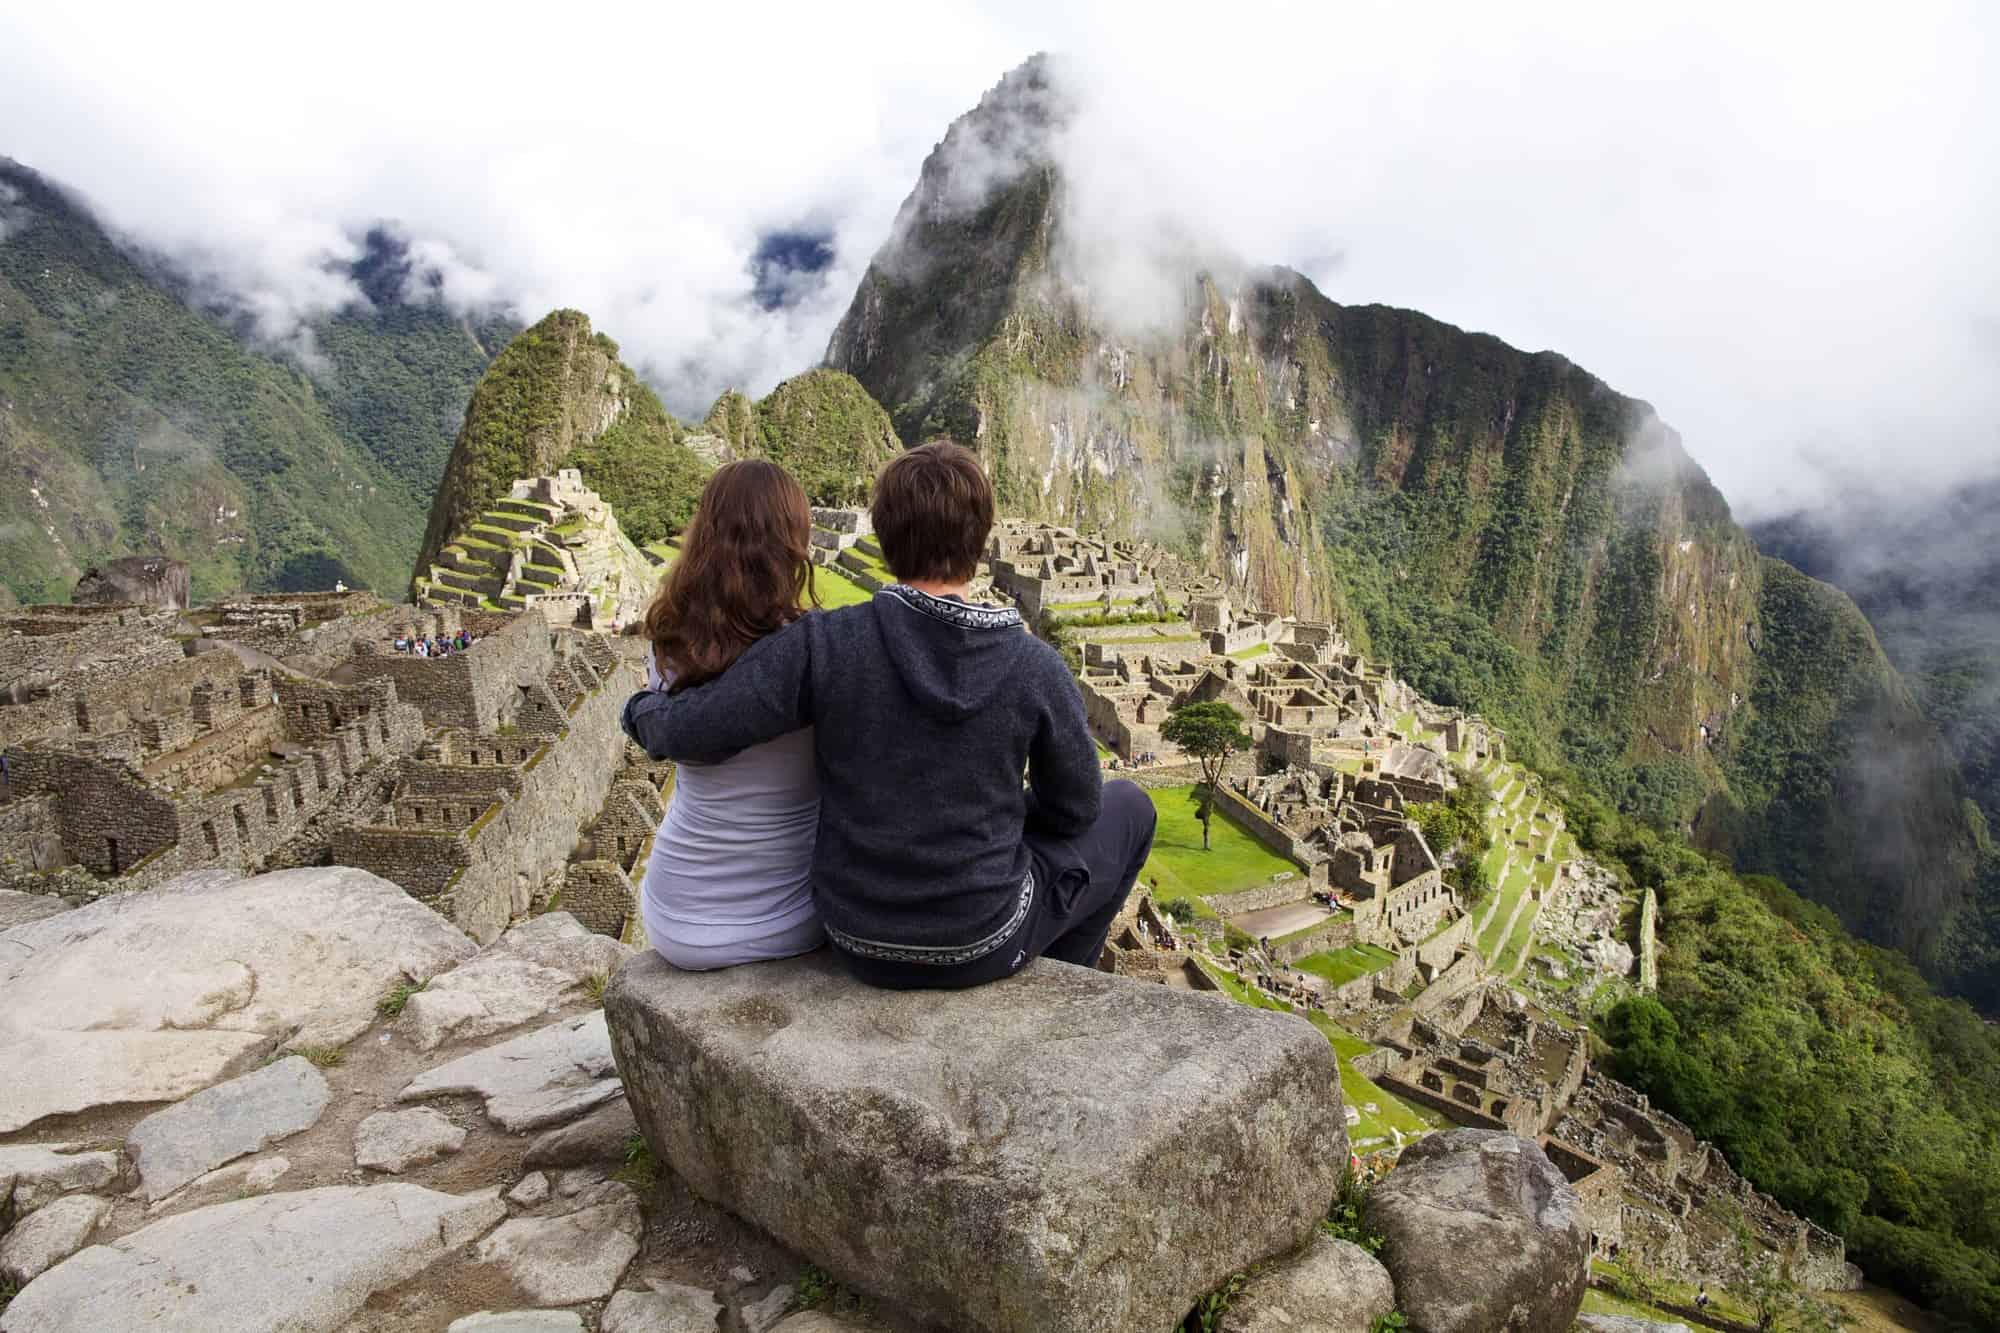 Canva Machu Picchu 2 Min - Viajes A Perú Y Machu Picchu | Tours Y Paquetes